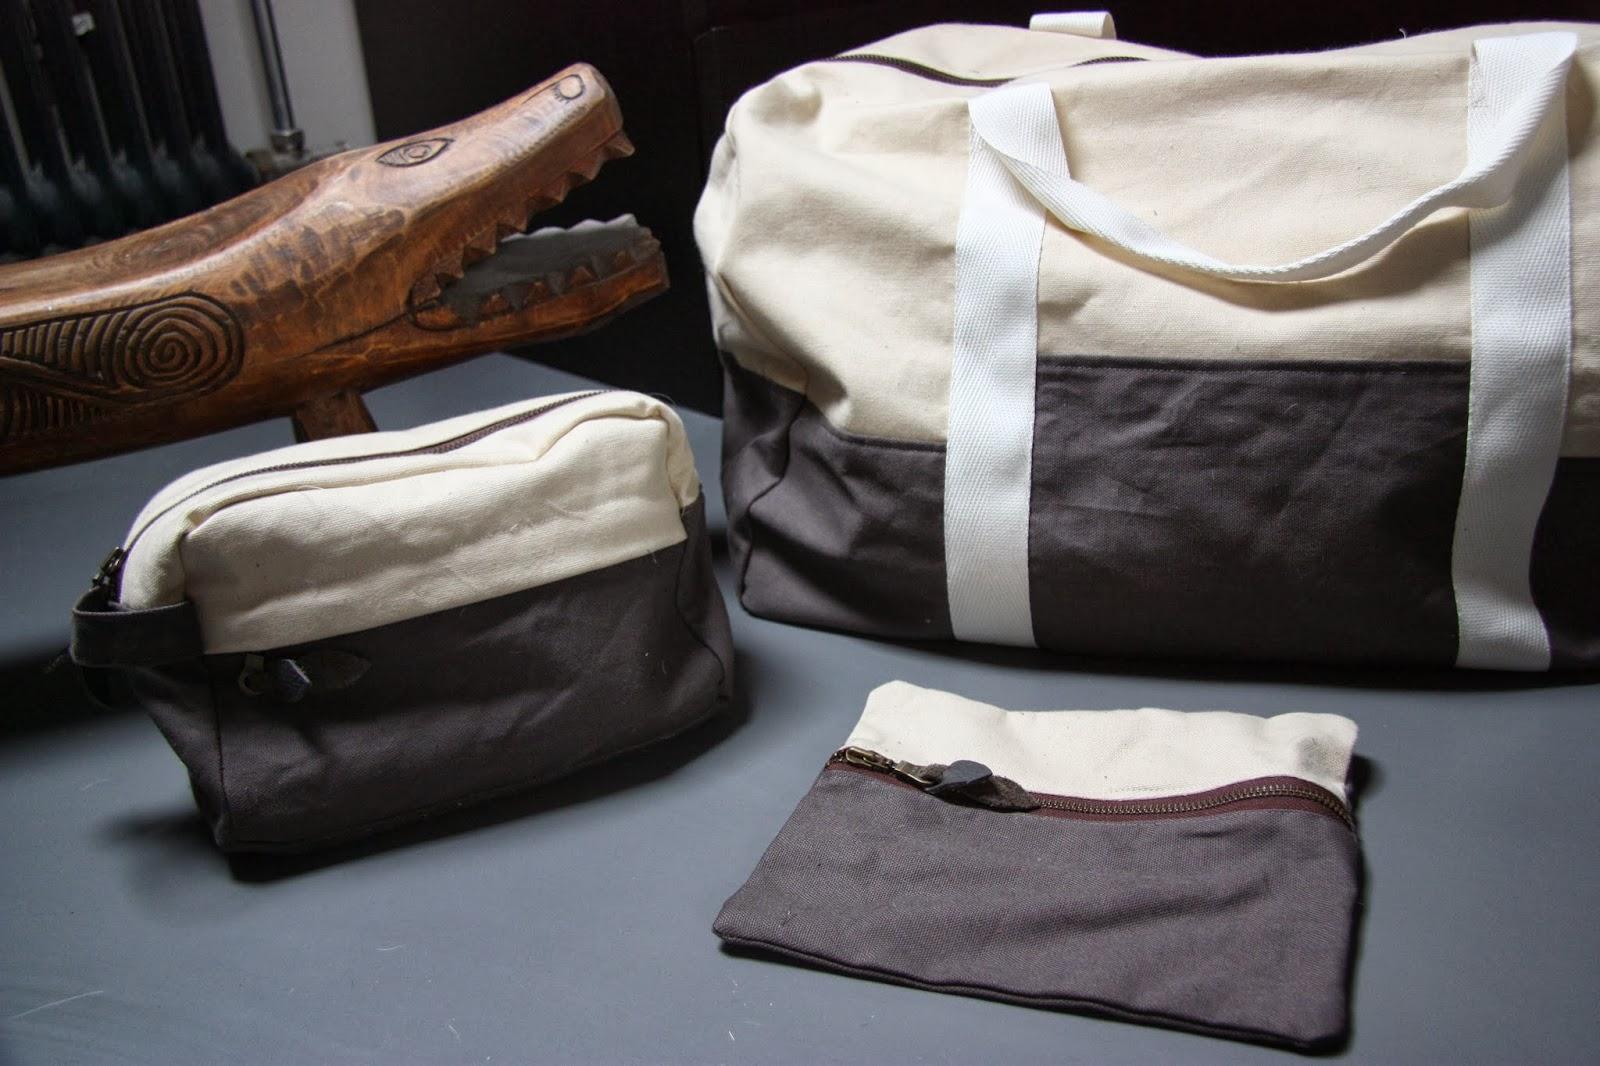 ecdbd70dbb Reves Mecanique  Three more bags